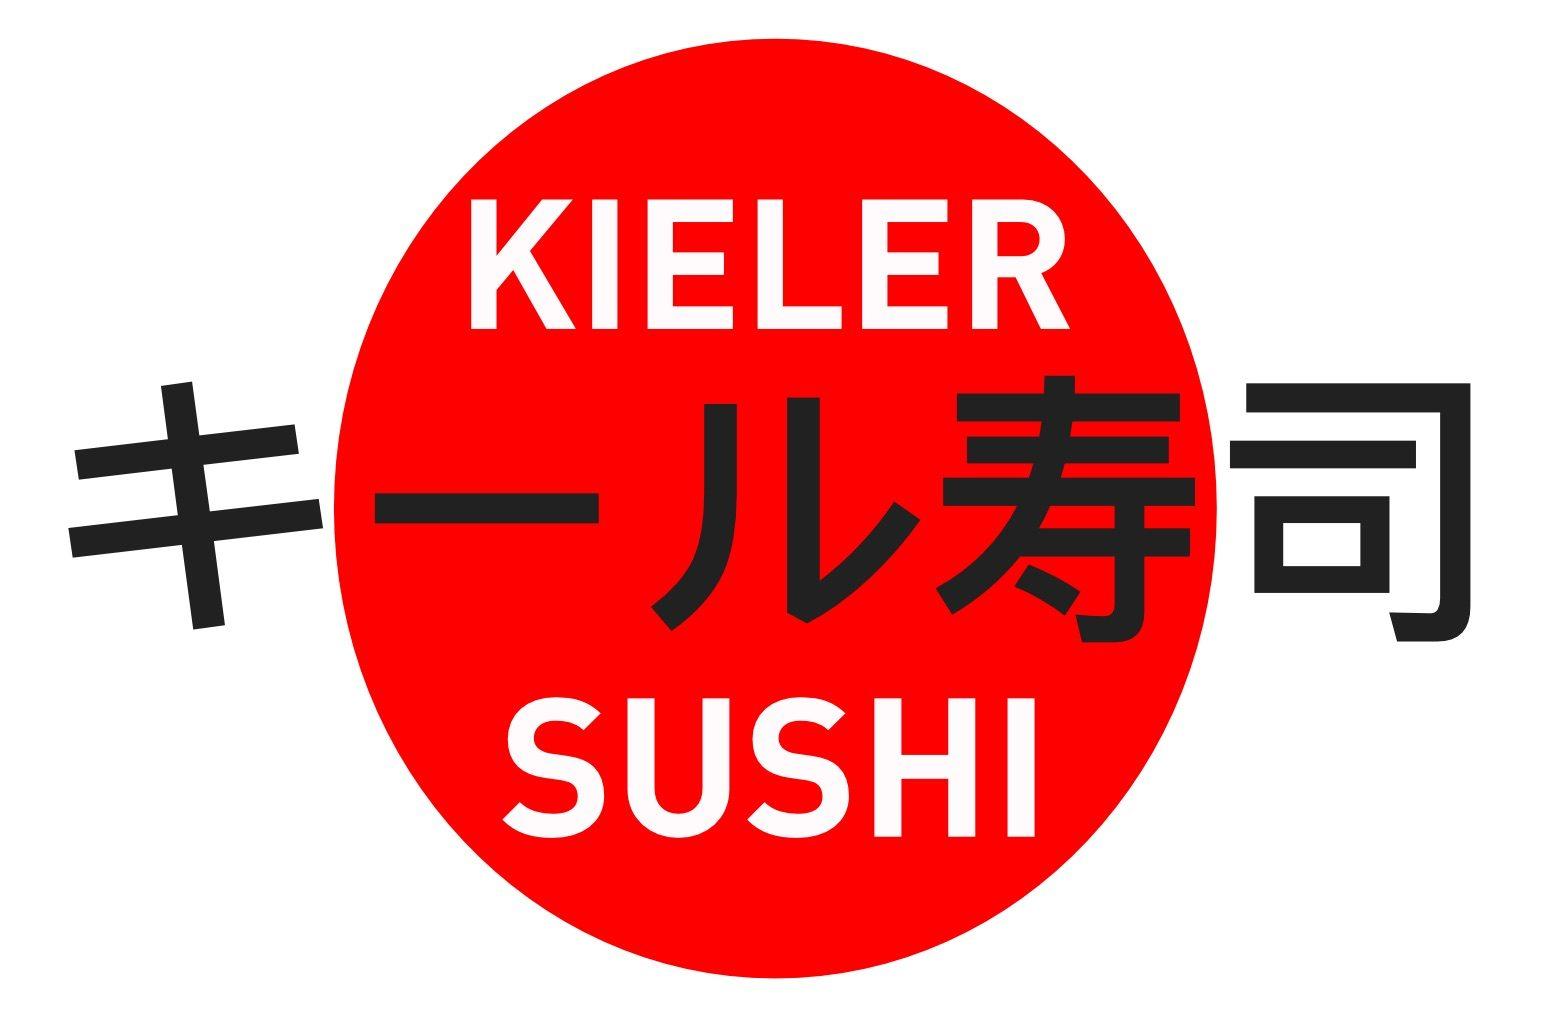 Kieler Sushi Technik